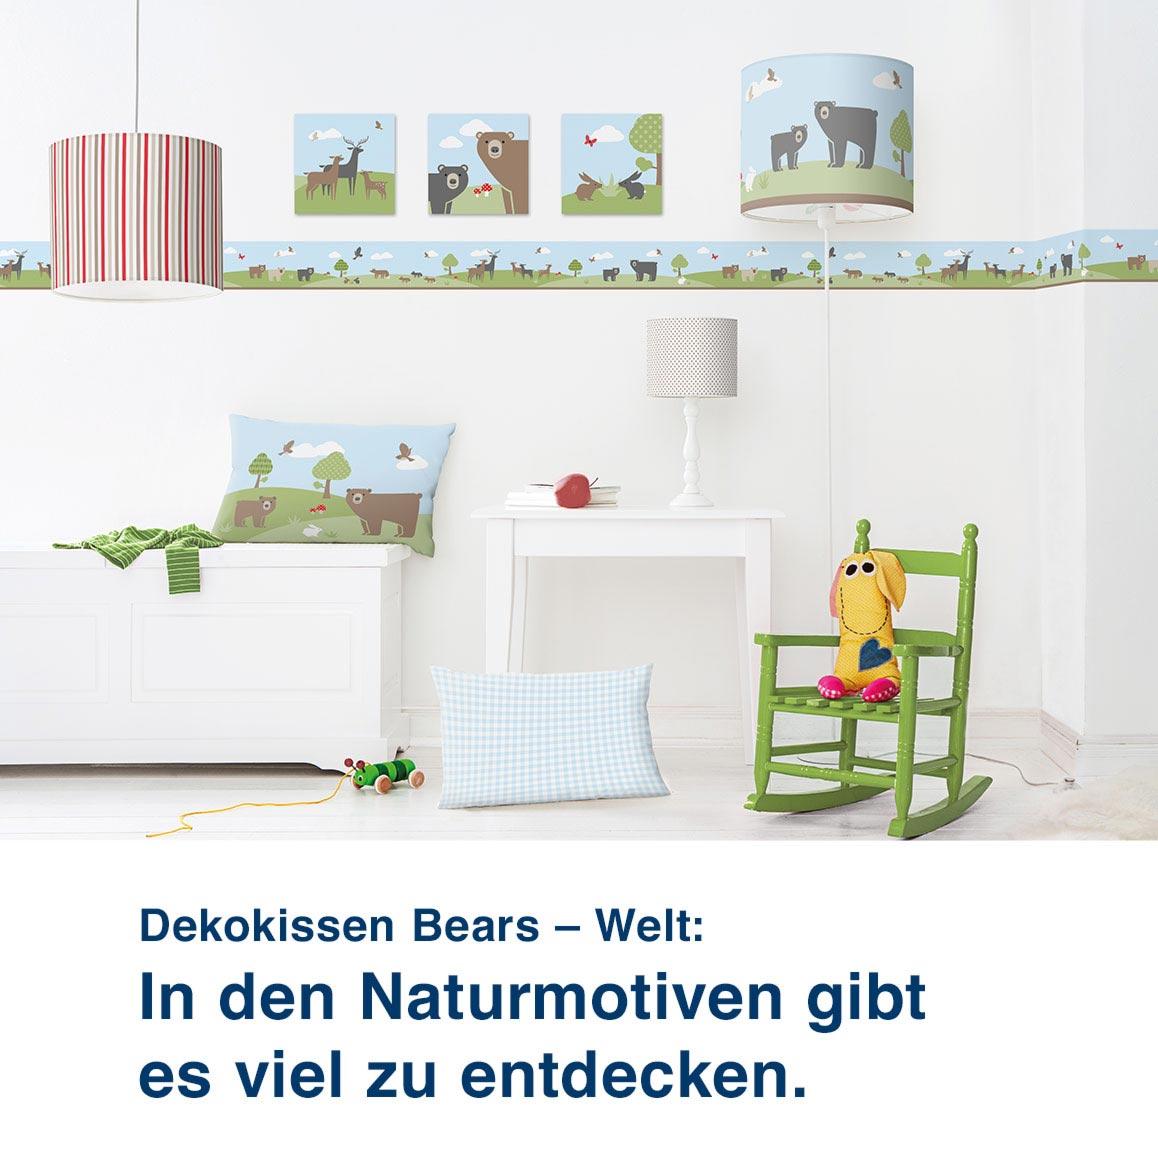 Dekokissen Bears – Welt:  In den Naturmotiven gibt  es viel zu entdecken.